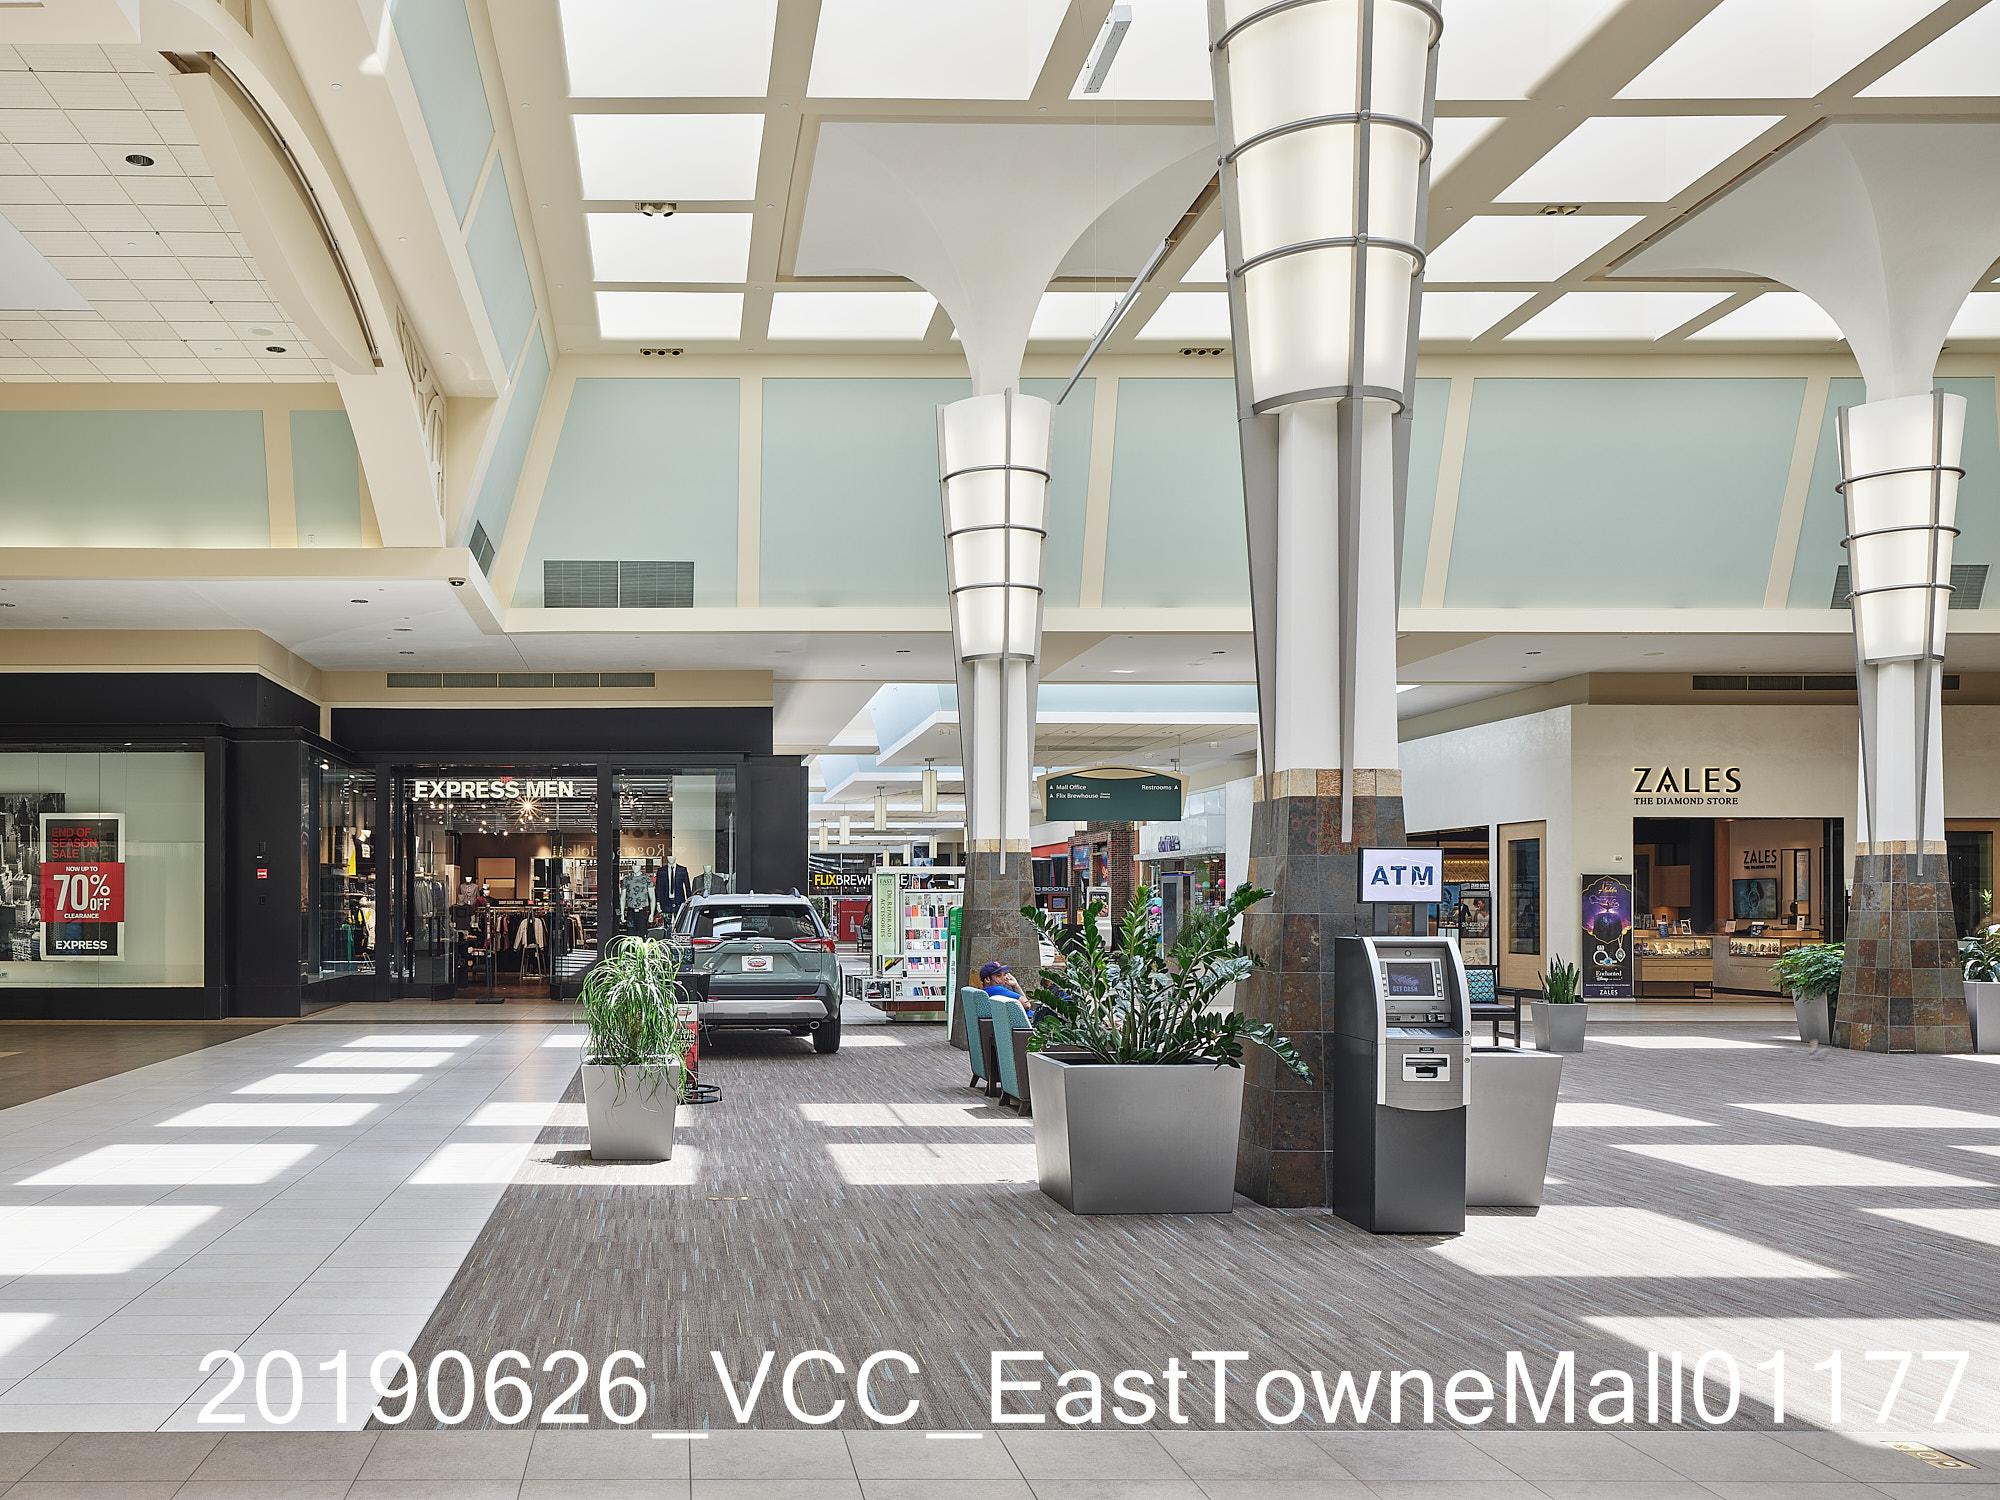 20190626_VCC_EastTowneMall01177.jpg